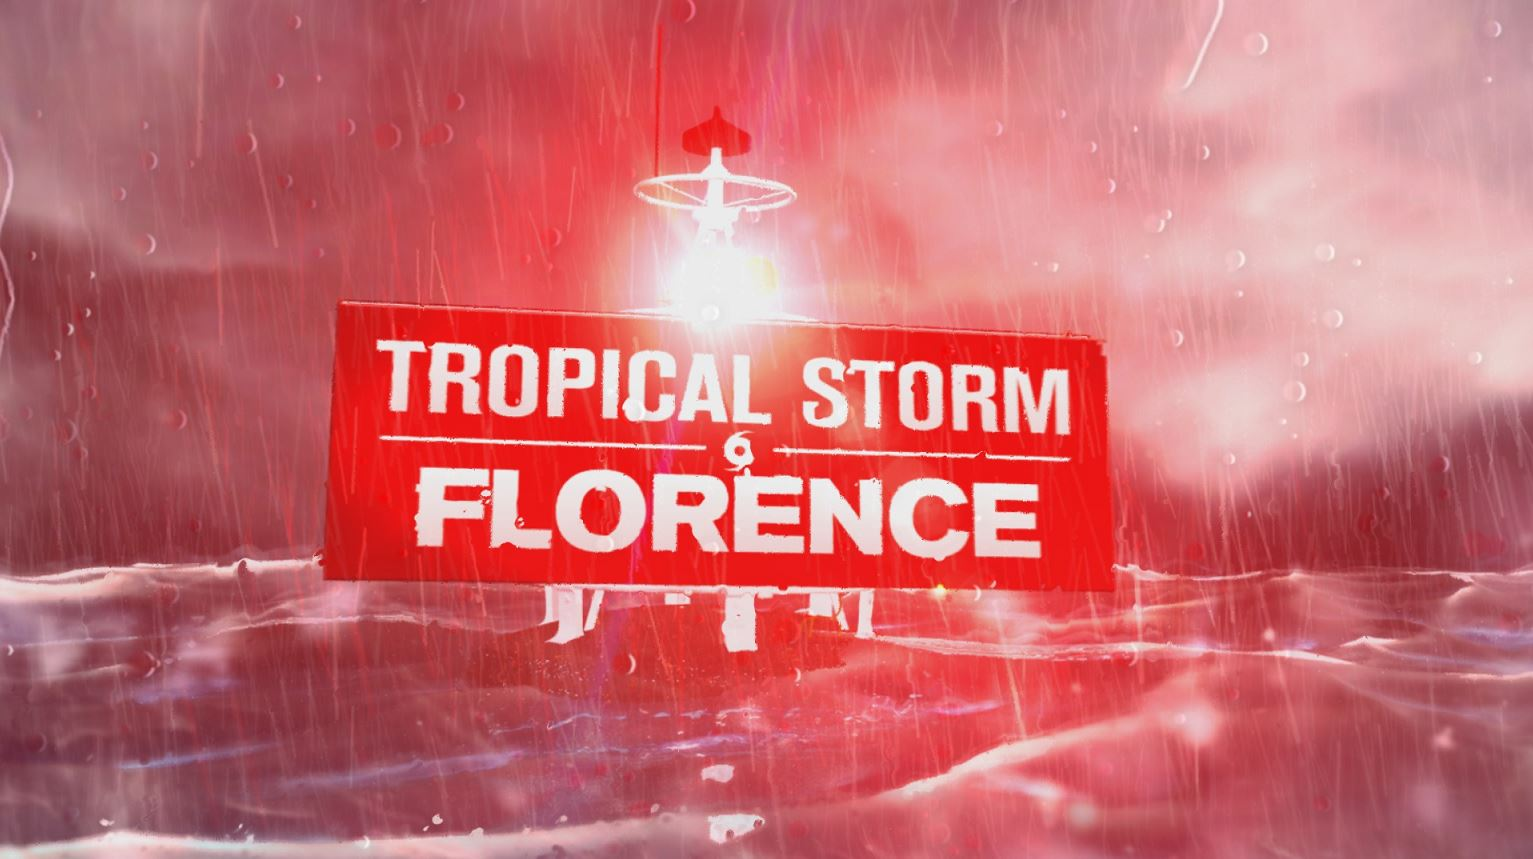 TROPICAL STORM FLORENCE_1536972509210.JPG.jpg